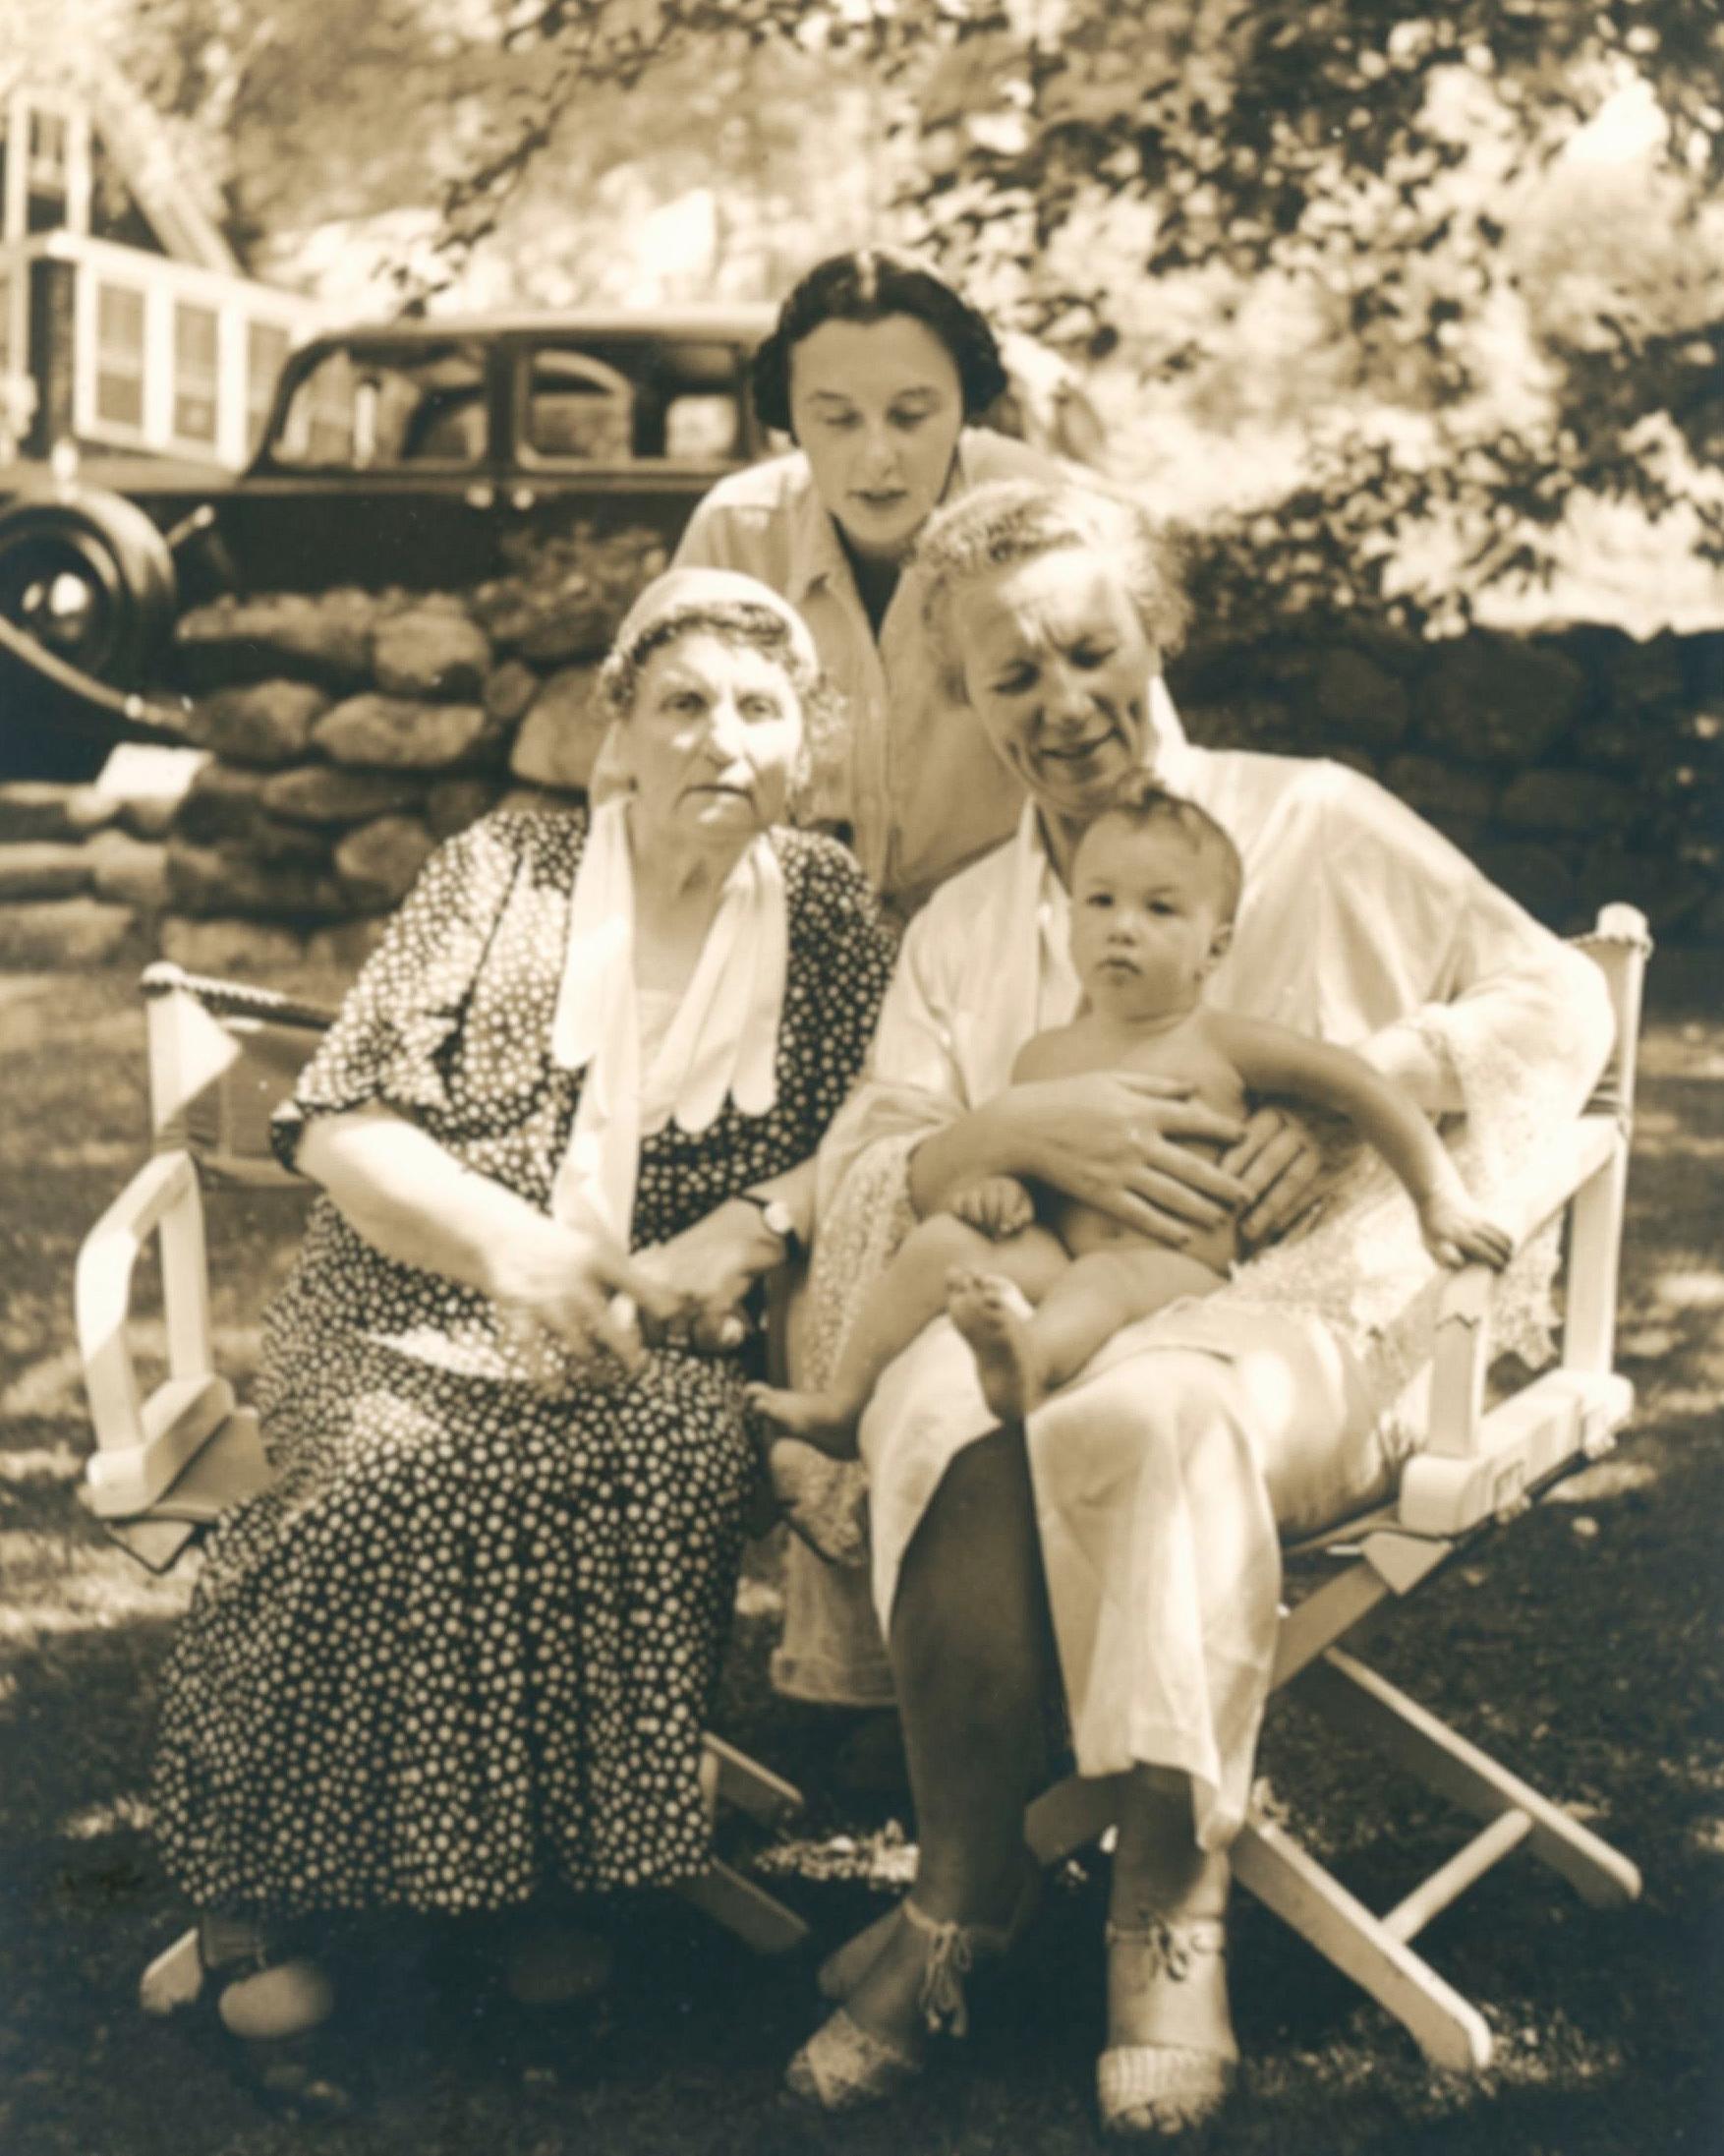 Four generations of first duaghers, 1936 Katherine Luboshutz, Lea Luboshutz, Irene Goldovsky Wolf, Alexandra Wolf.  Courtesy of the Luboshutz-Goldovssky-Wolf family archive.